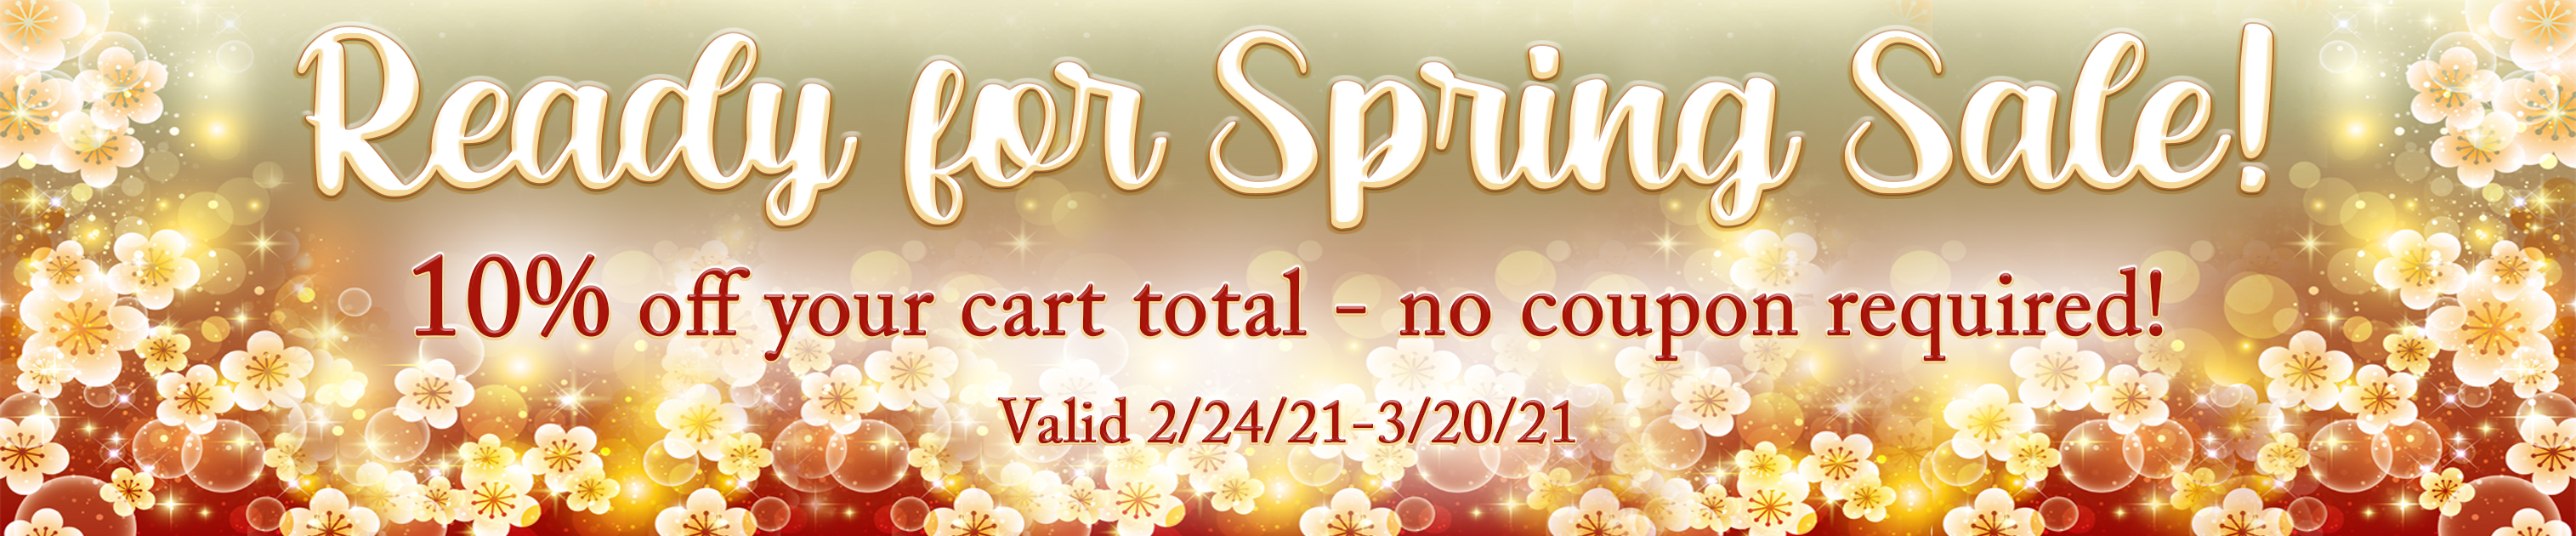 spring-sale-blooms-gold-dp-.jpg